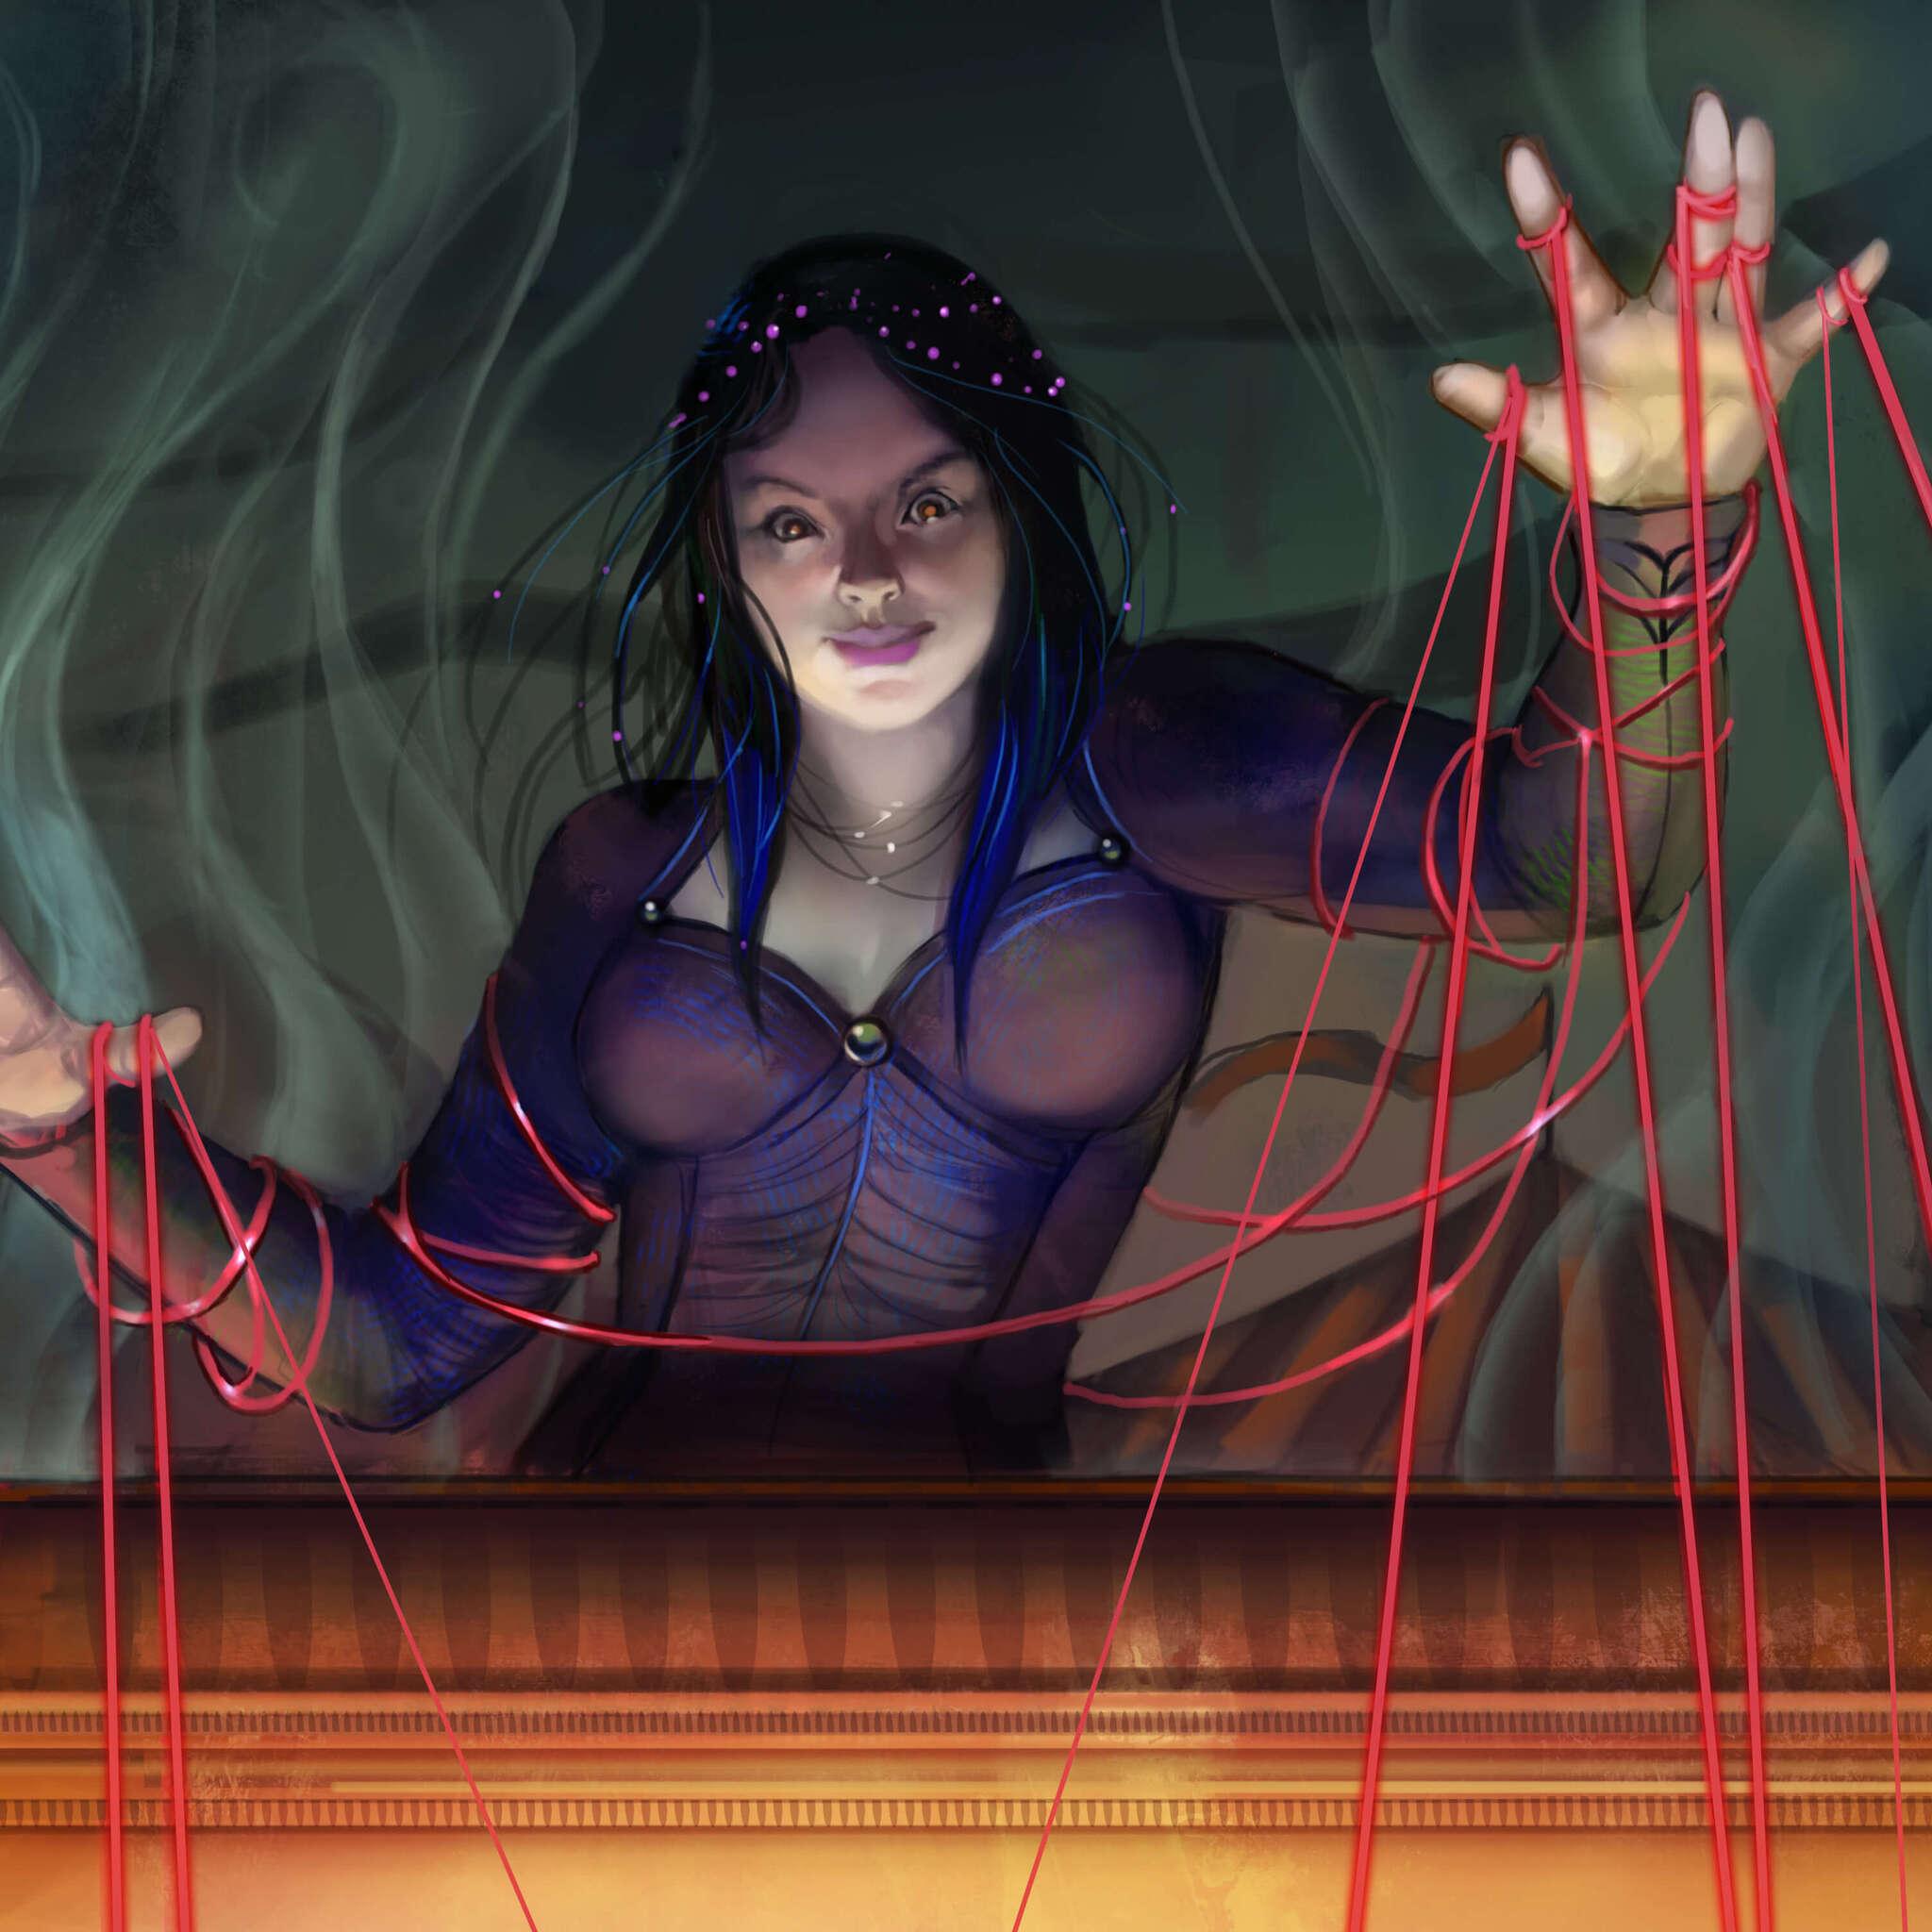 melisande-the-puppet-mistress-27.jpg